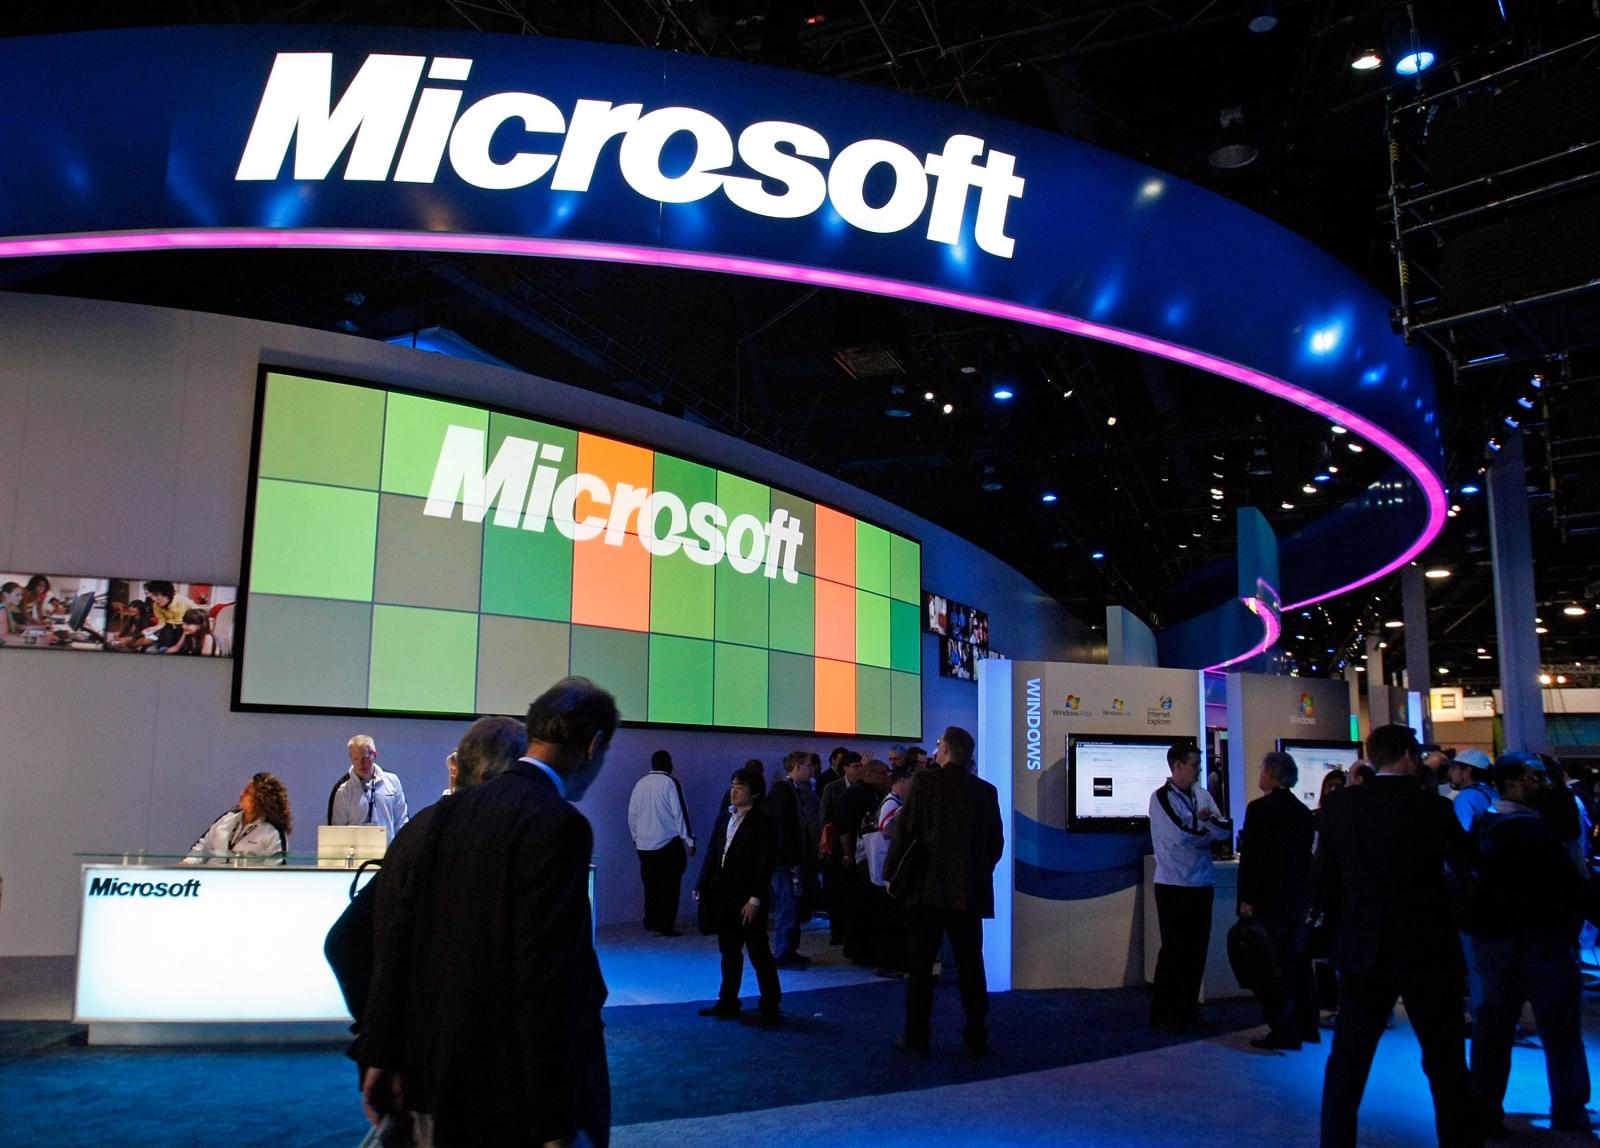 Microsoft sells $19.75 billion of bonds